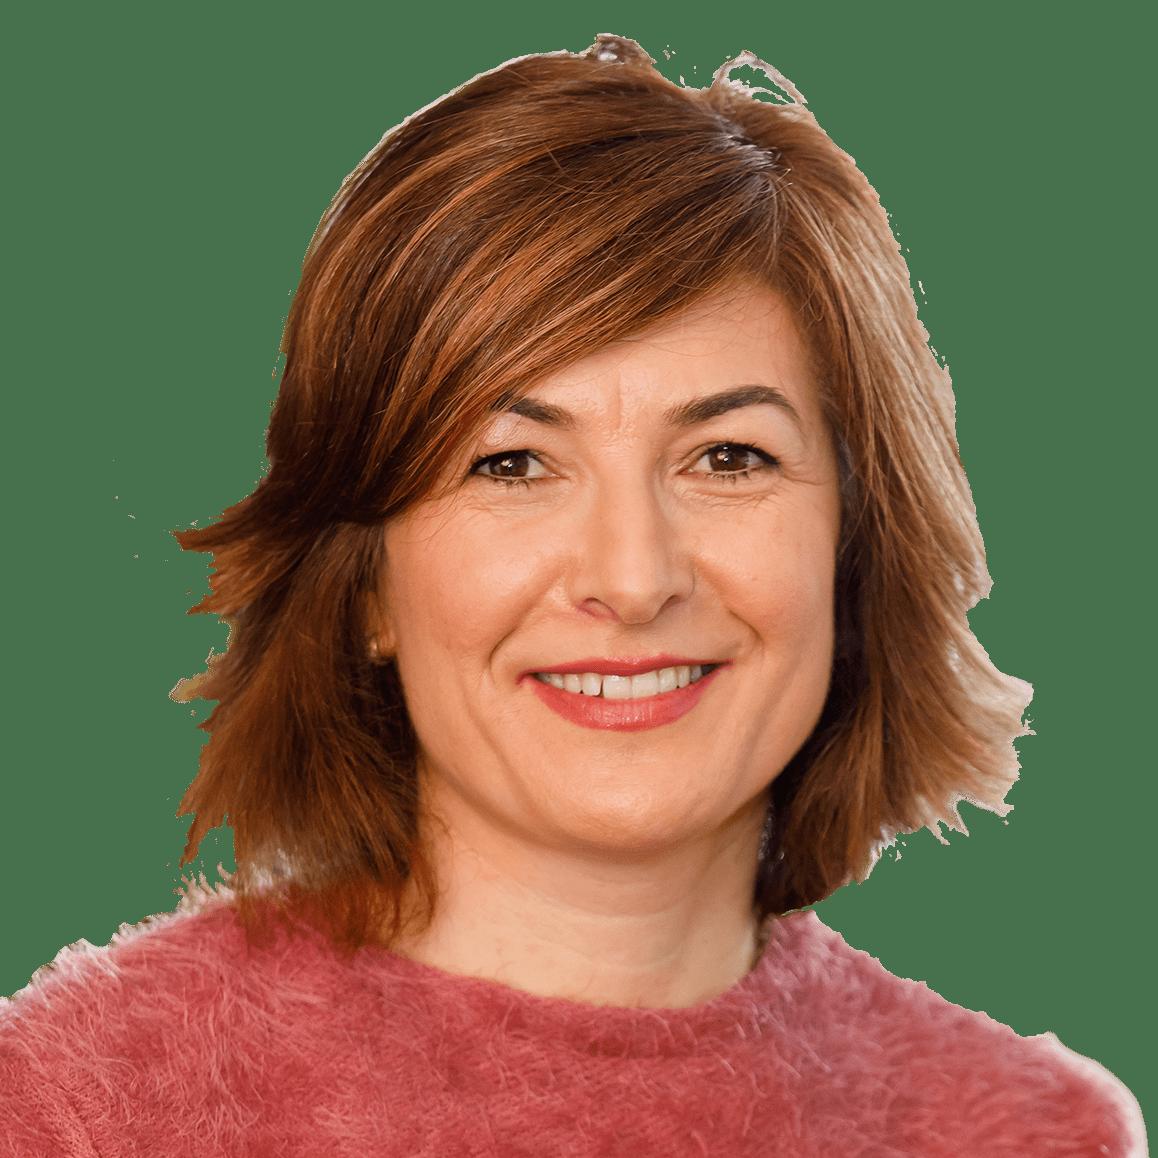 Alejandra Regueira web